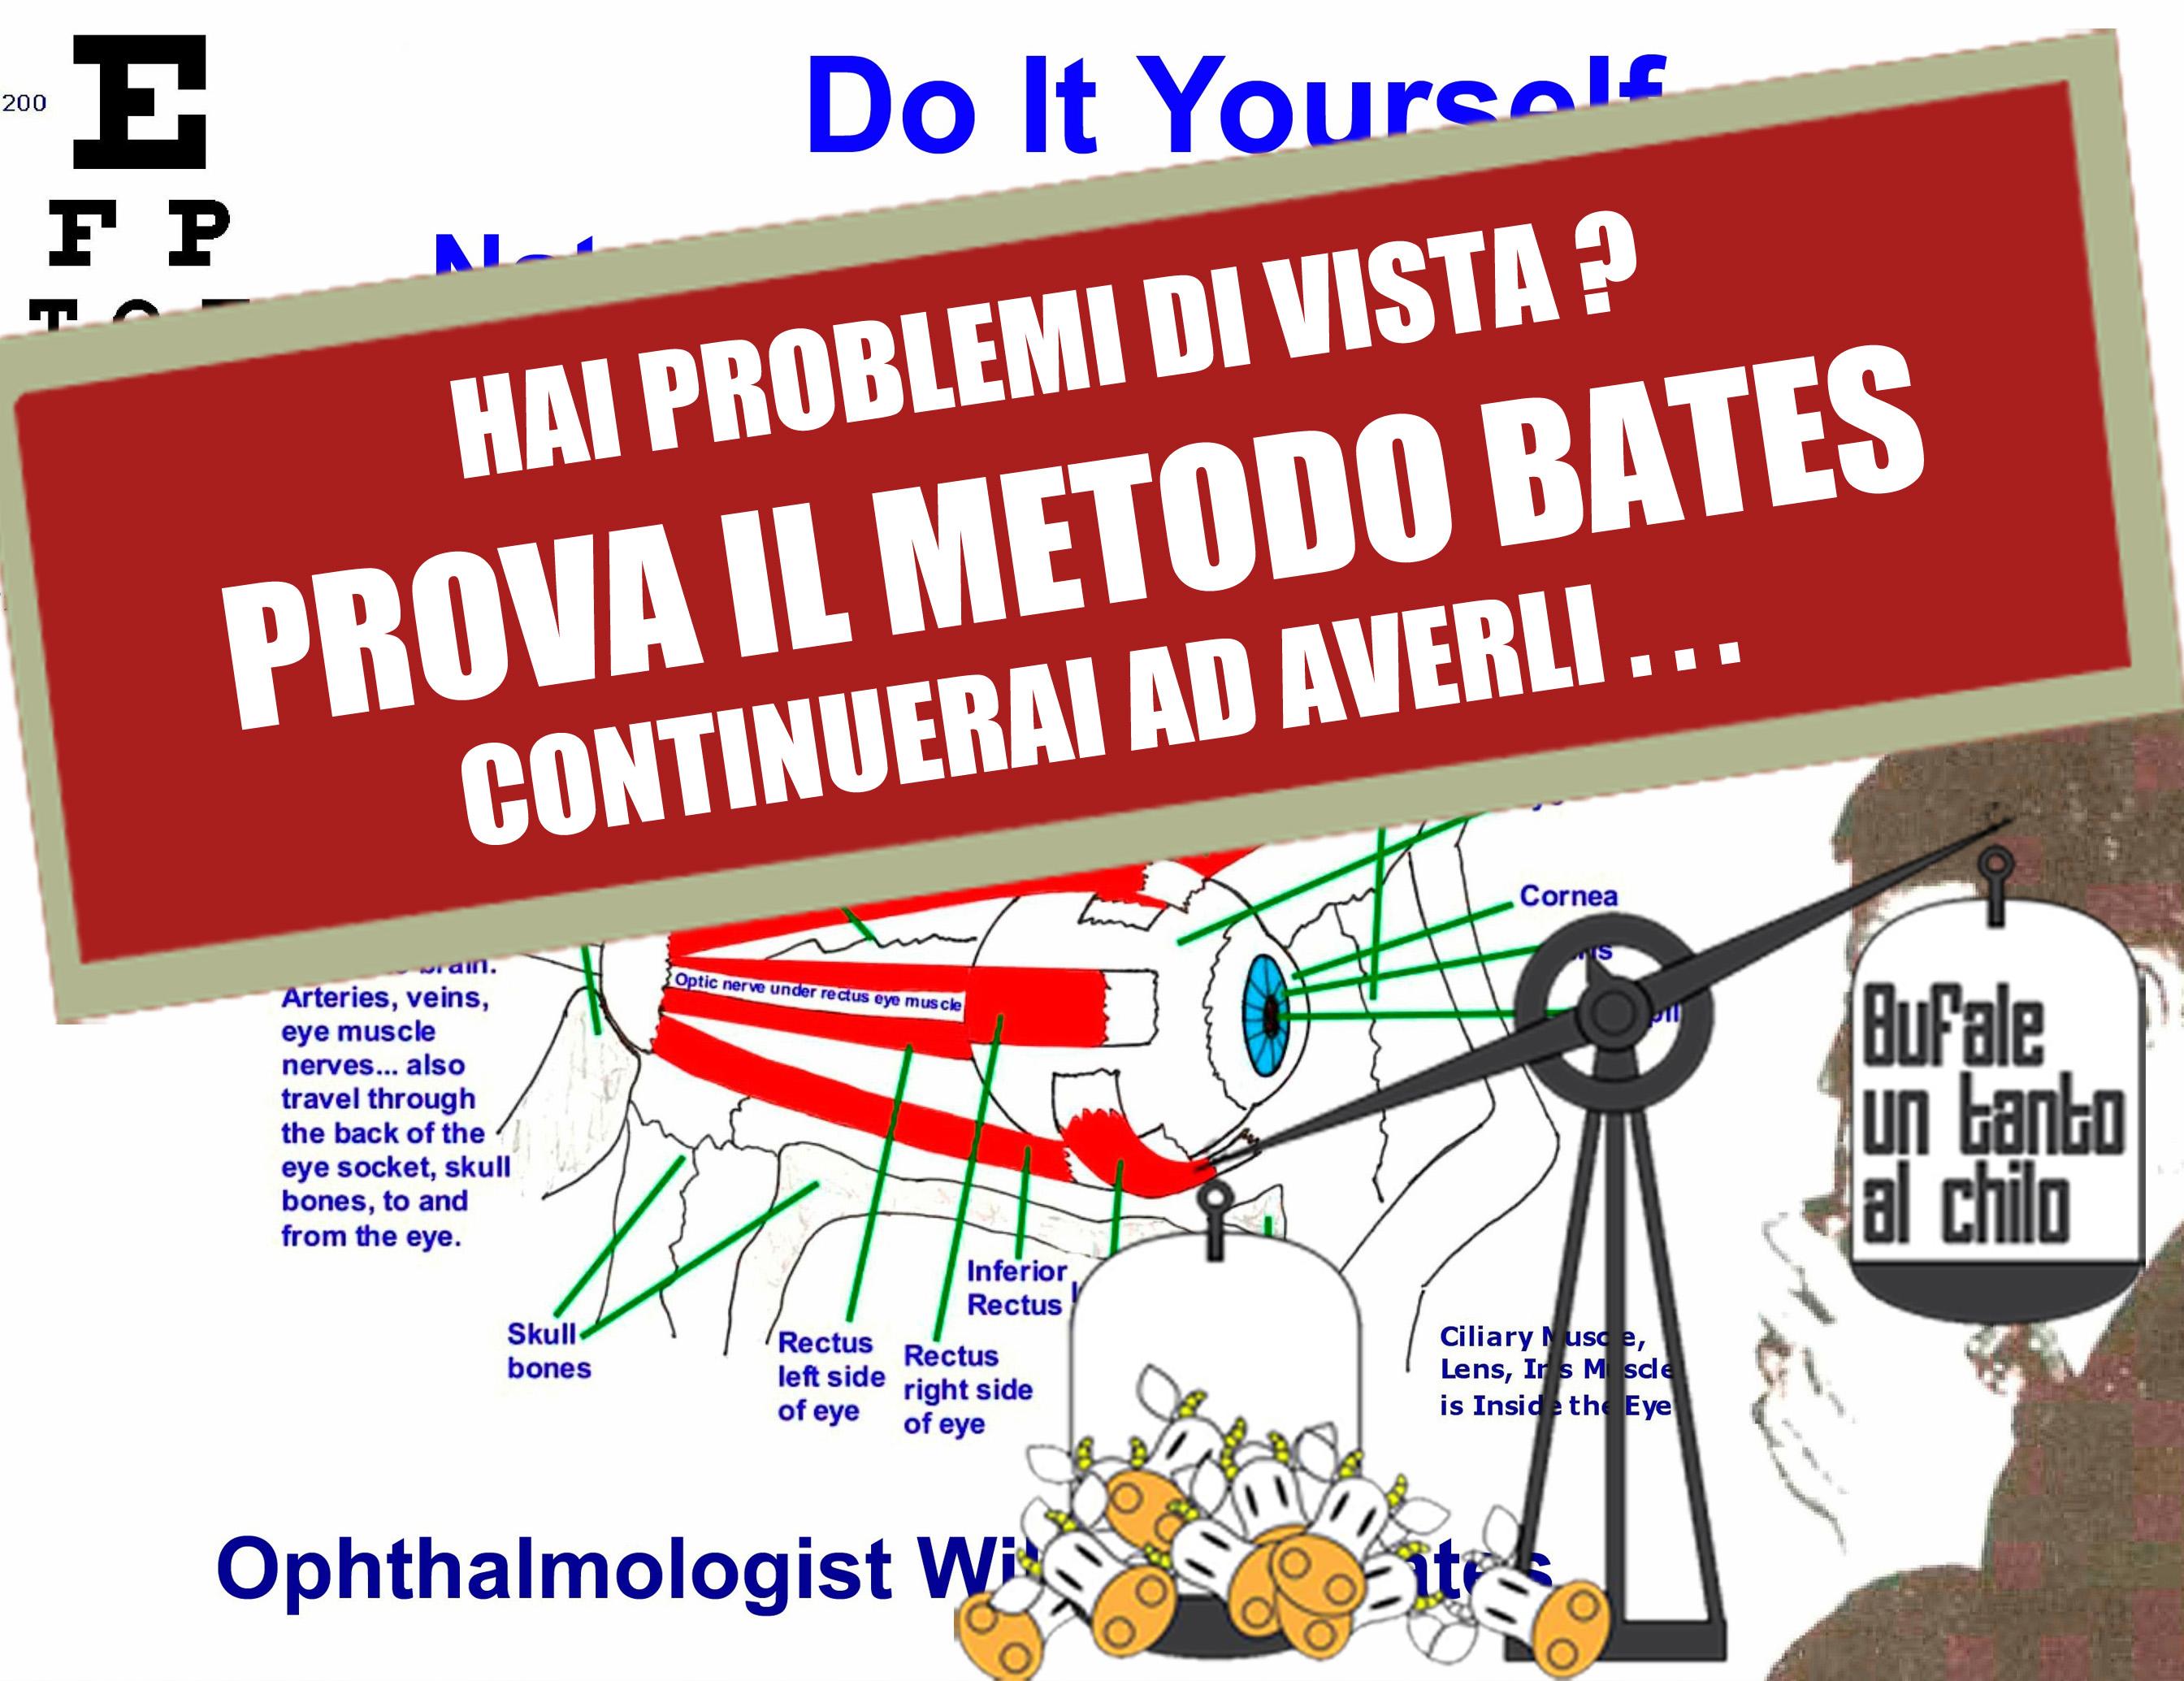 metodobates